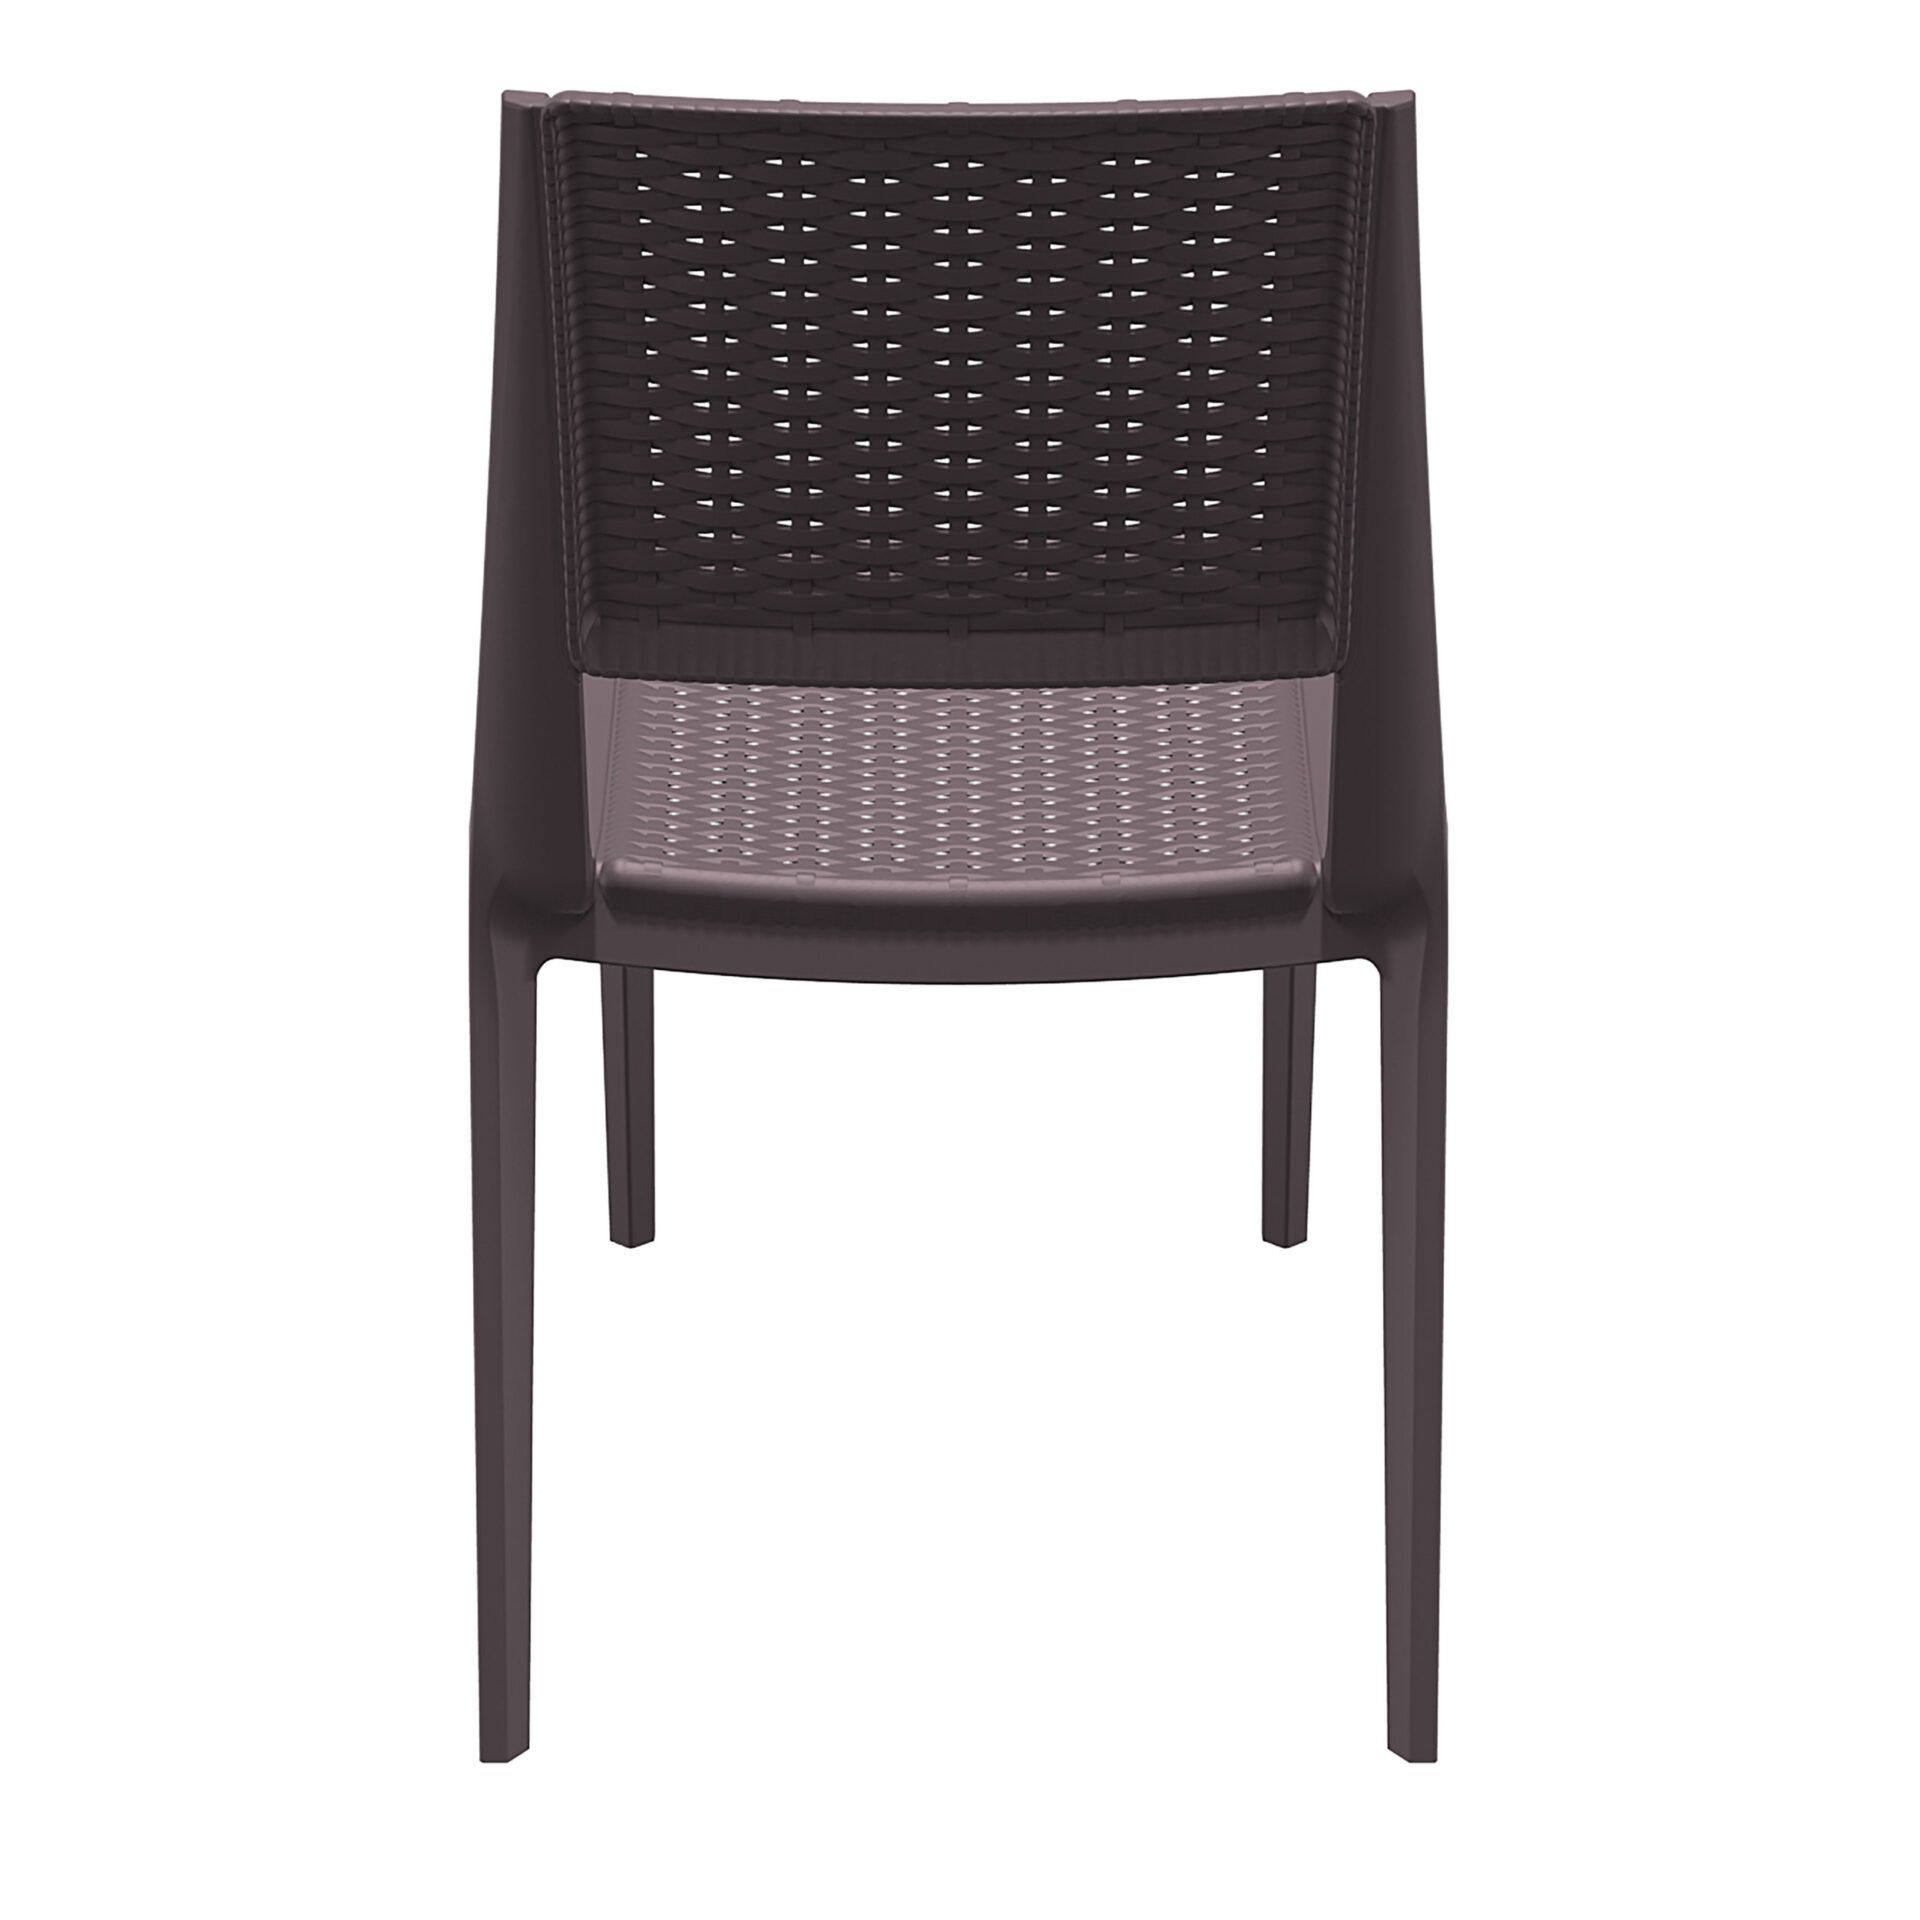 resin rattan outdoor cafe verona chair brown back